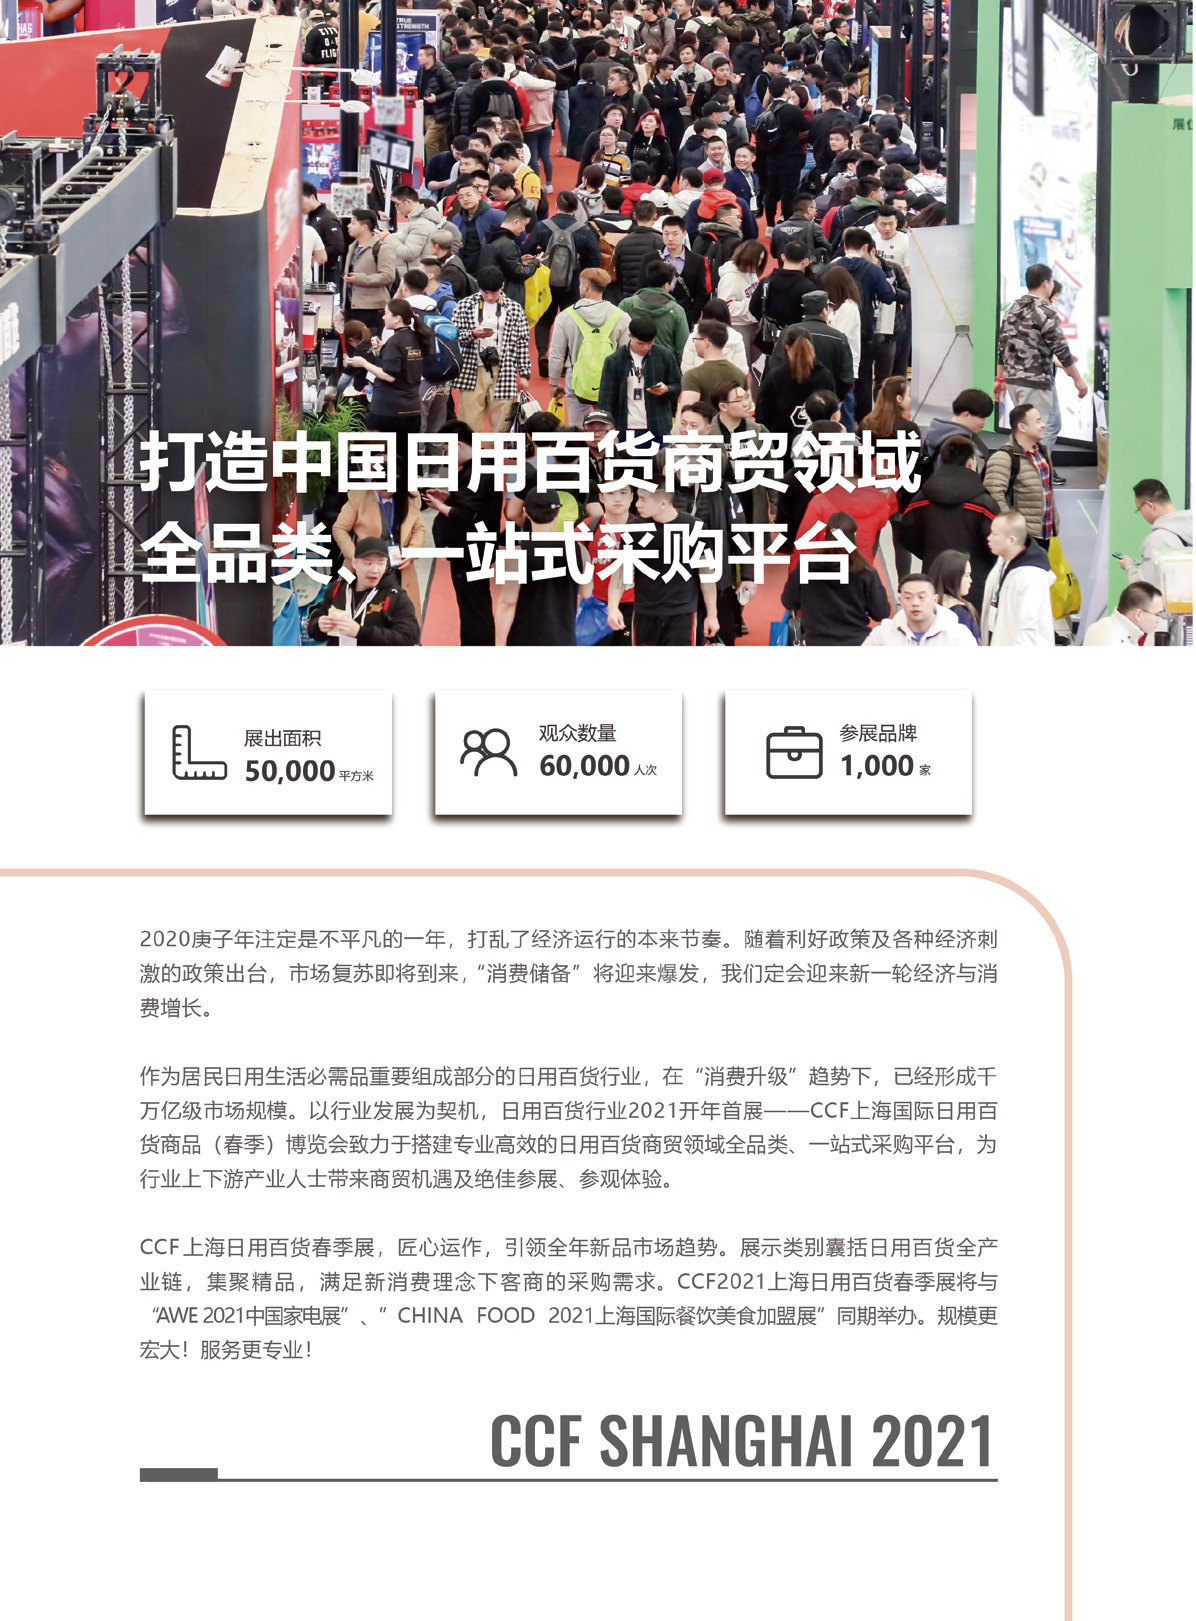 CCF春季百货展2021邀请_页面_04.jpg